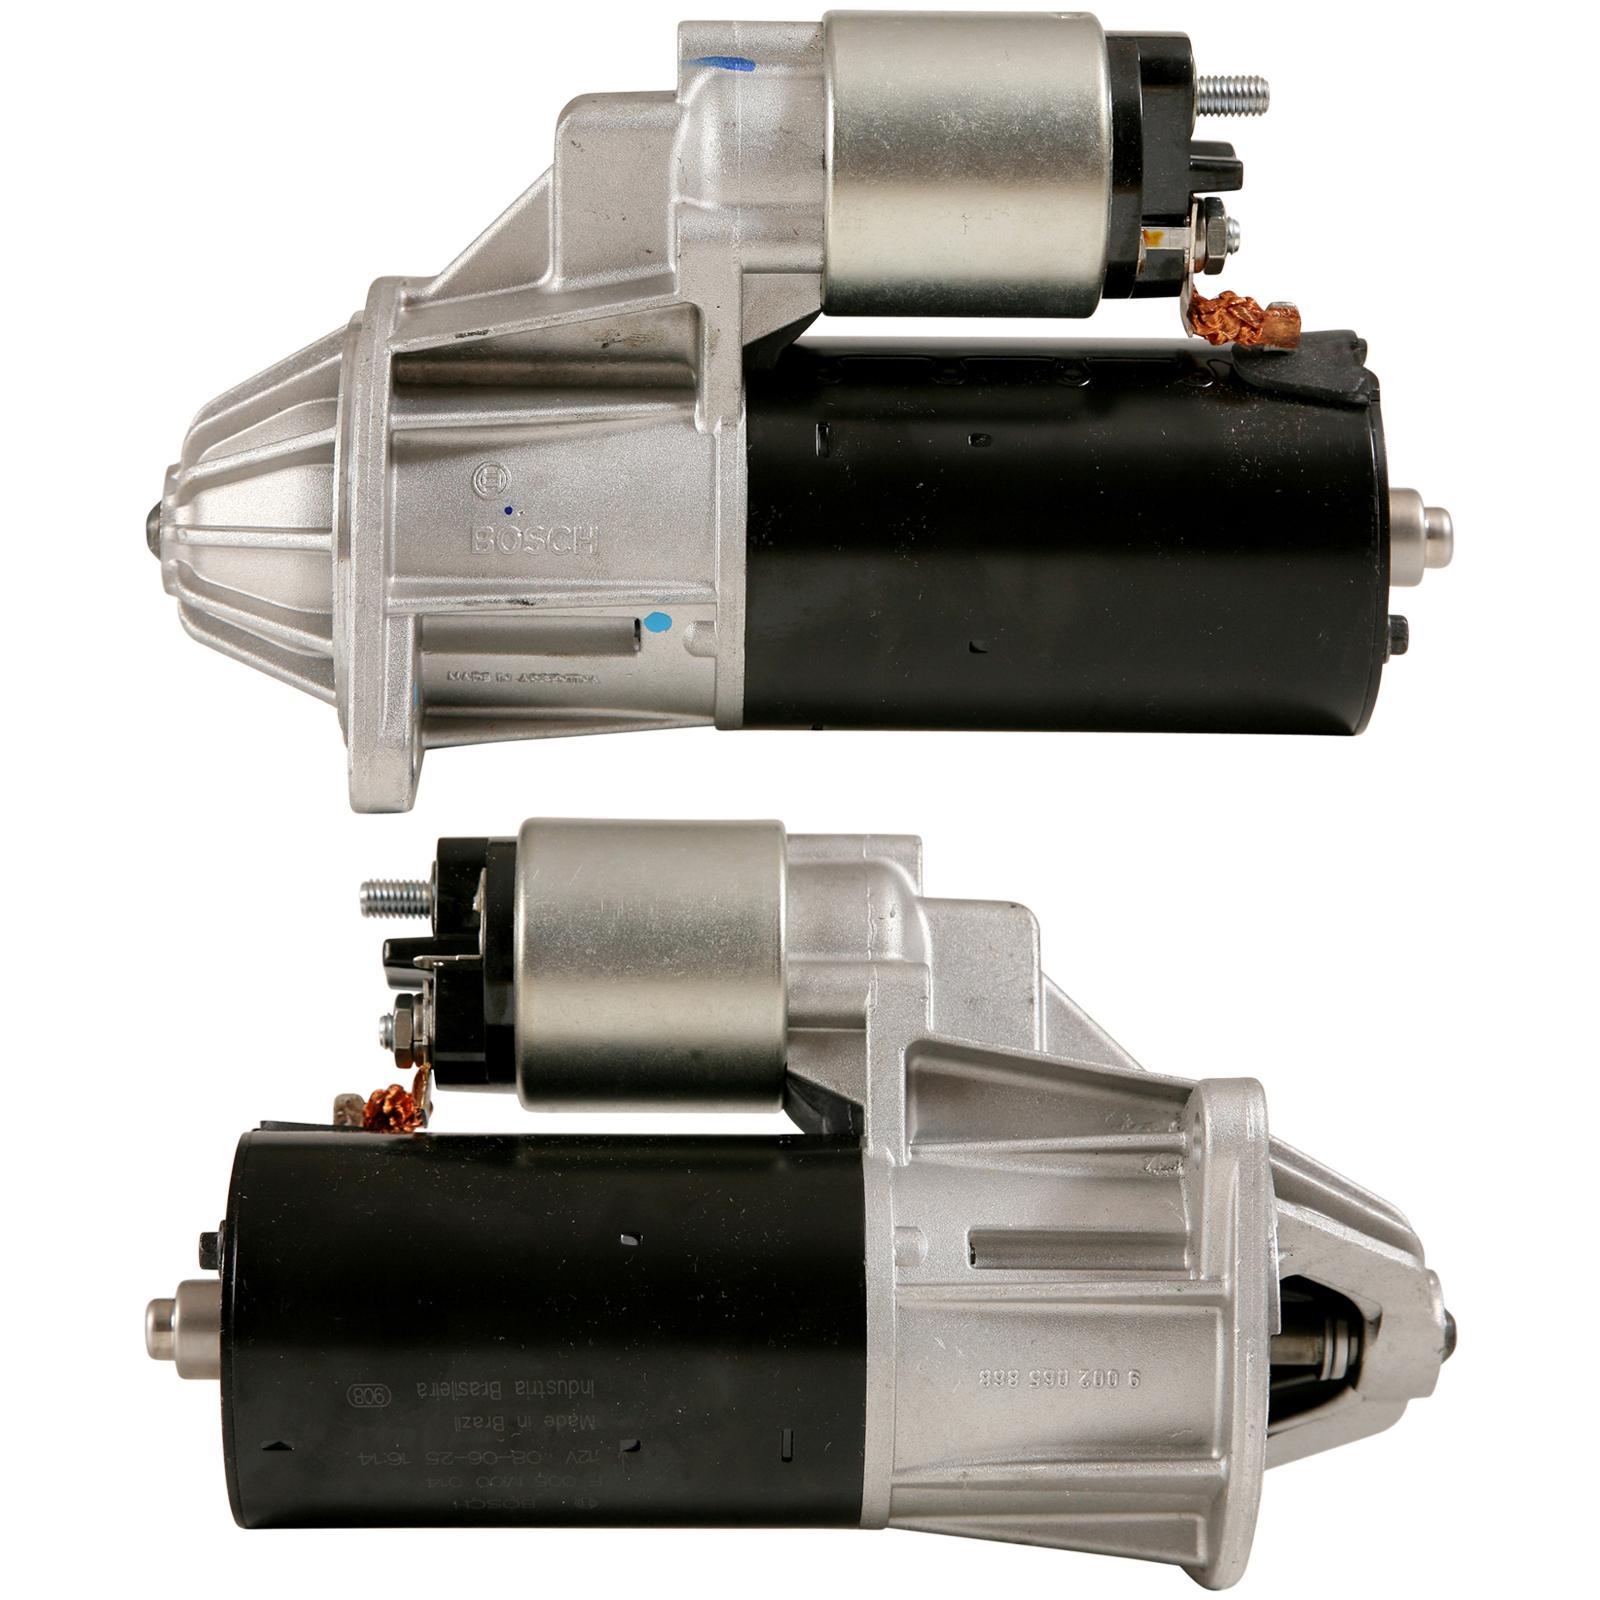 Holden 304 Starter Motor Wiring Diagram Diagrams Jeffdoedesign Com Single Phase Magnetic